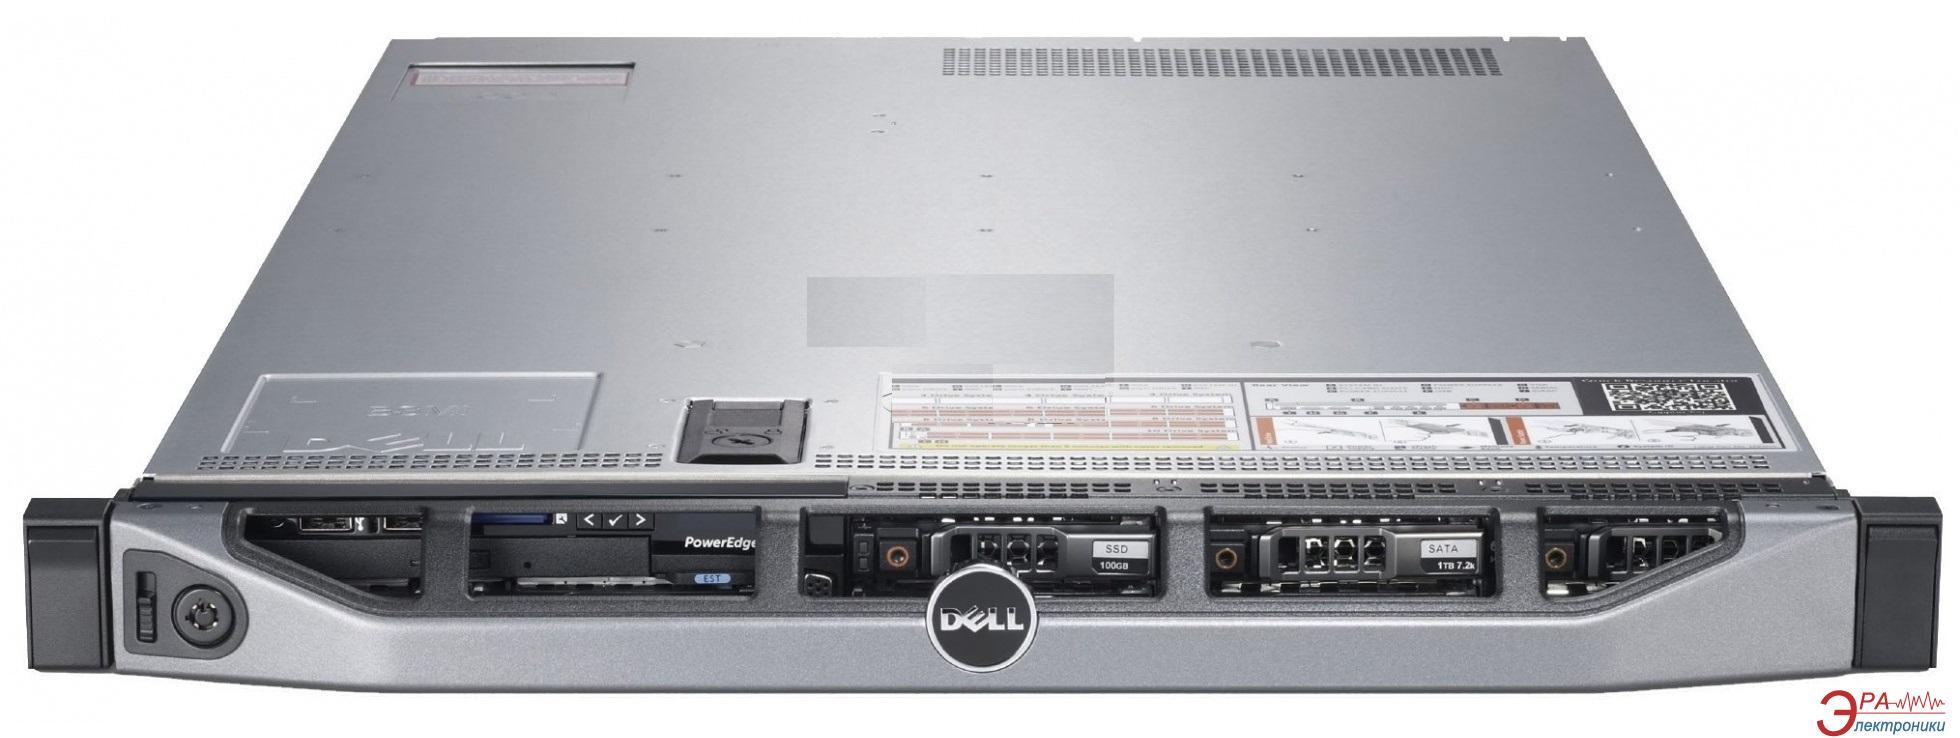 Сервер DELL PowerEdge R320 (210-R320-LFFN)